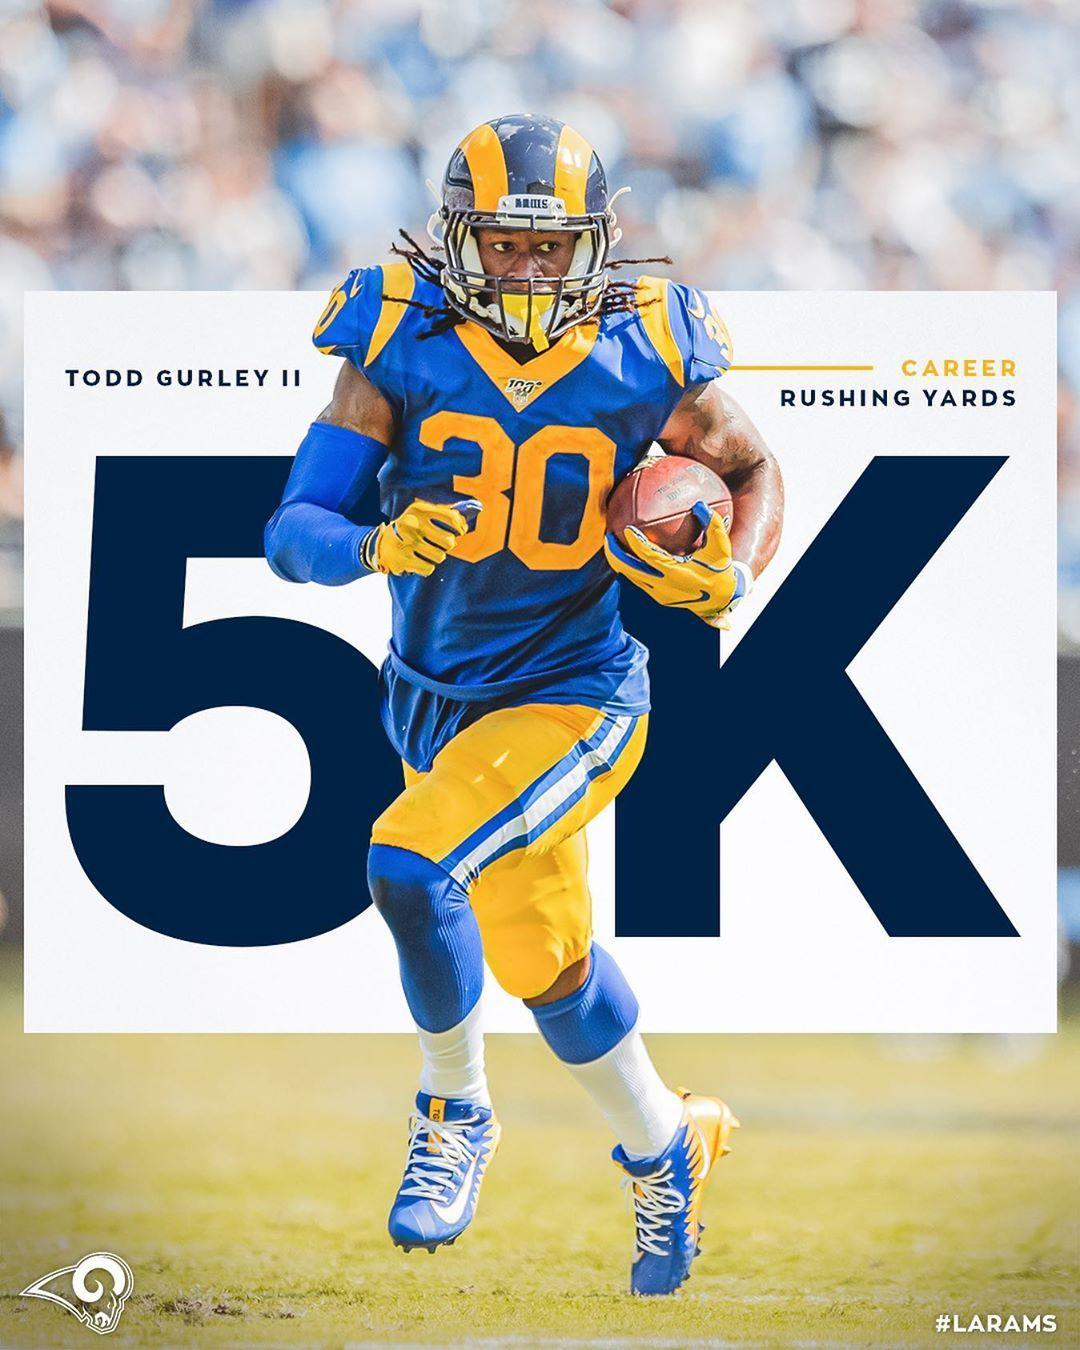 Los Angeles Rams On Instagram 5 000 Career Rushing Yards Congrats Tg4hunnid Los Angeles Rams La Rams Los Angeles